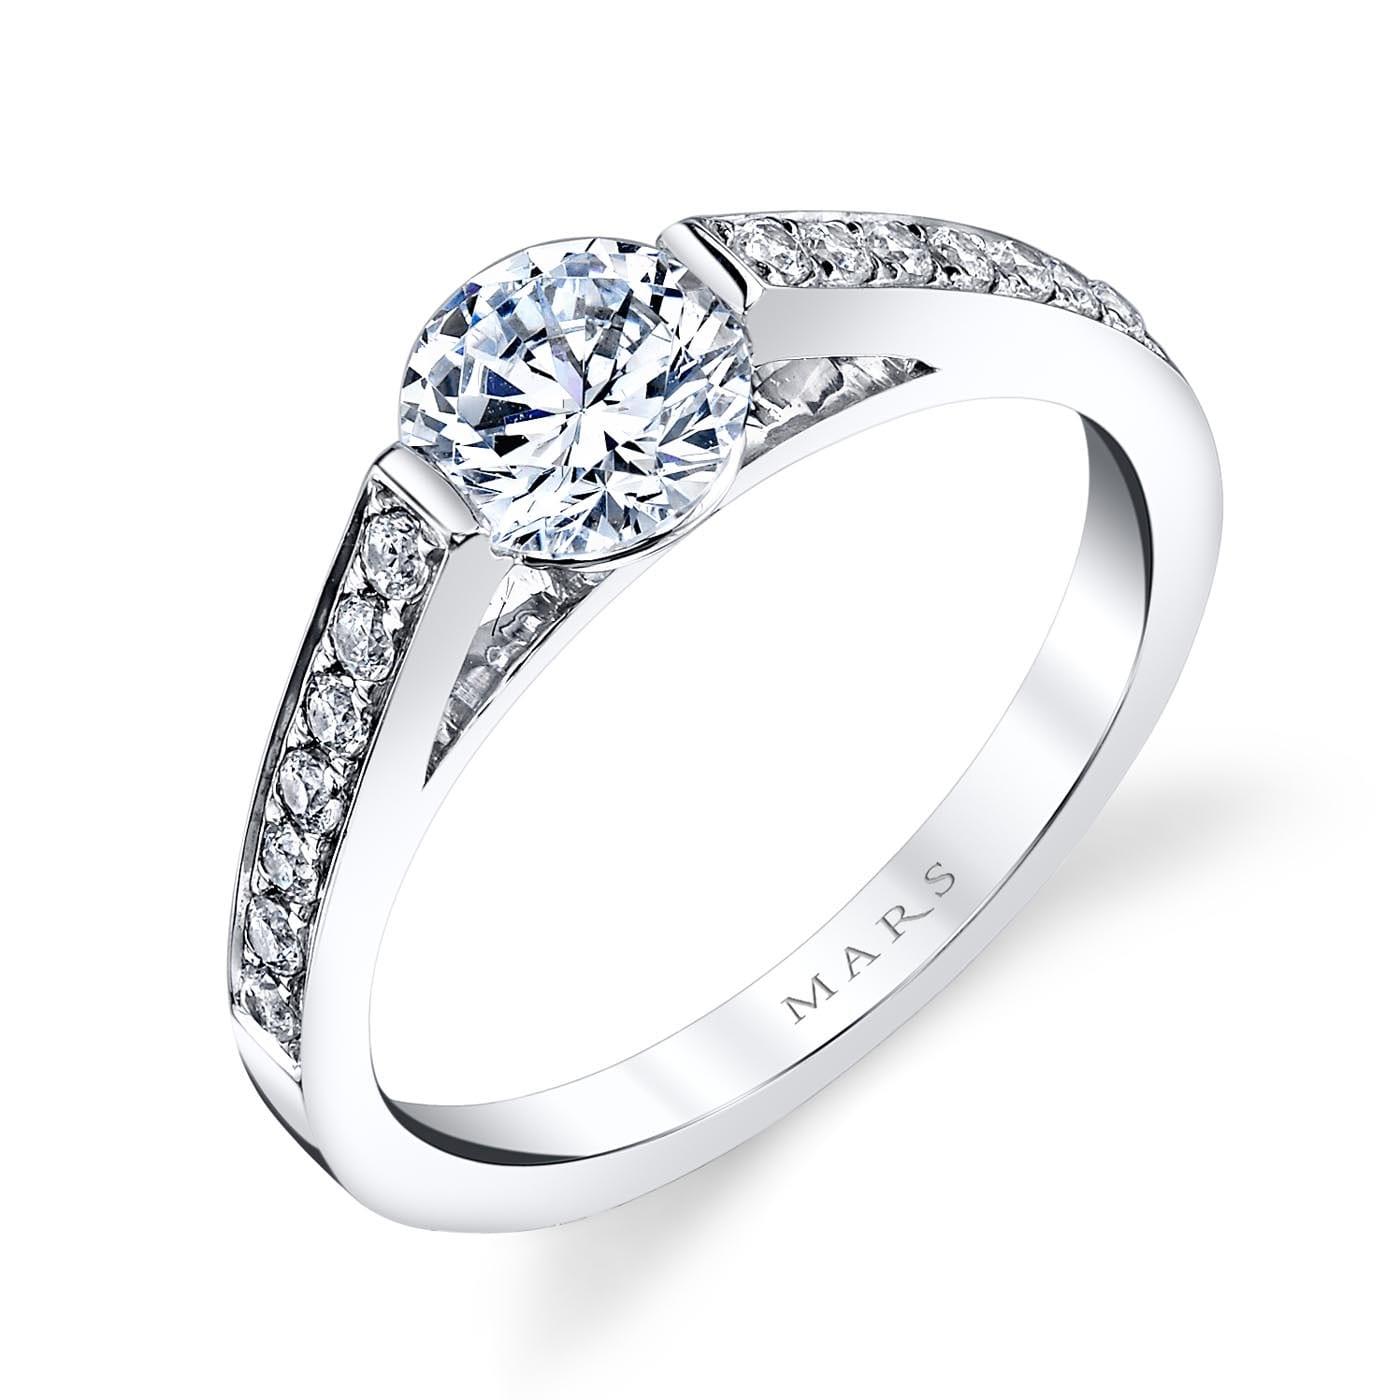 Modern Engagement RingStyle #: MARS 25721